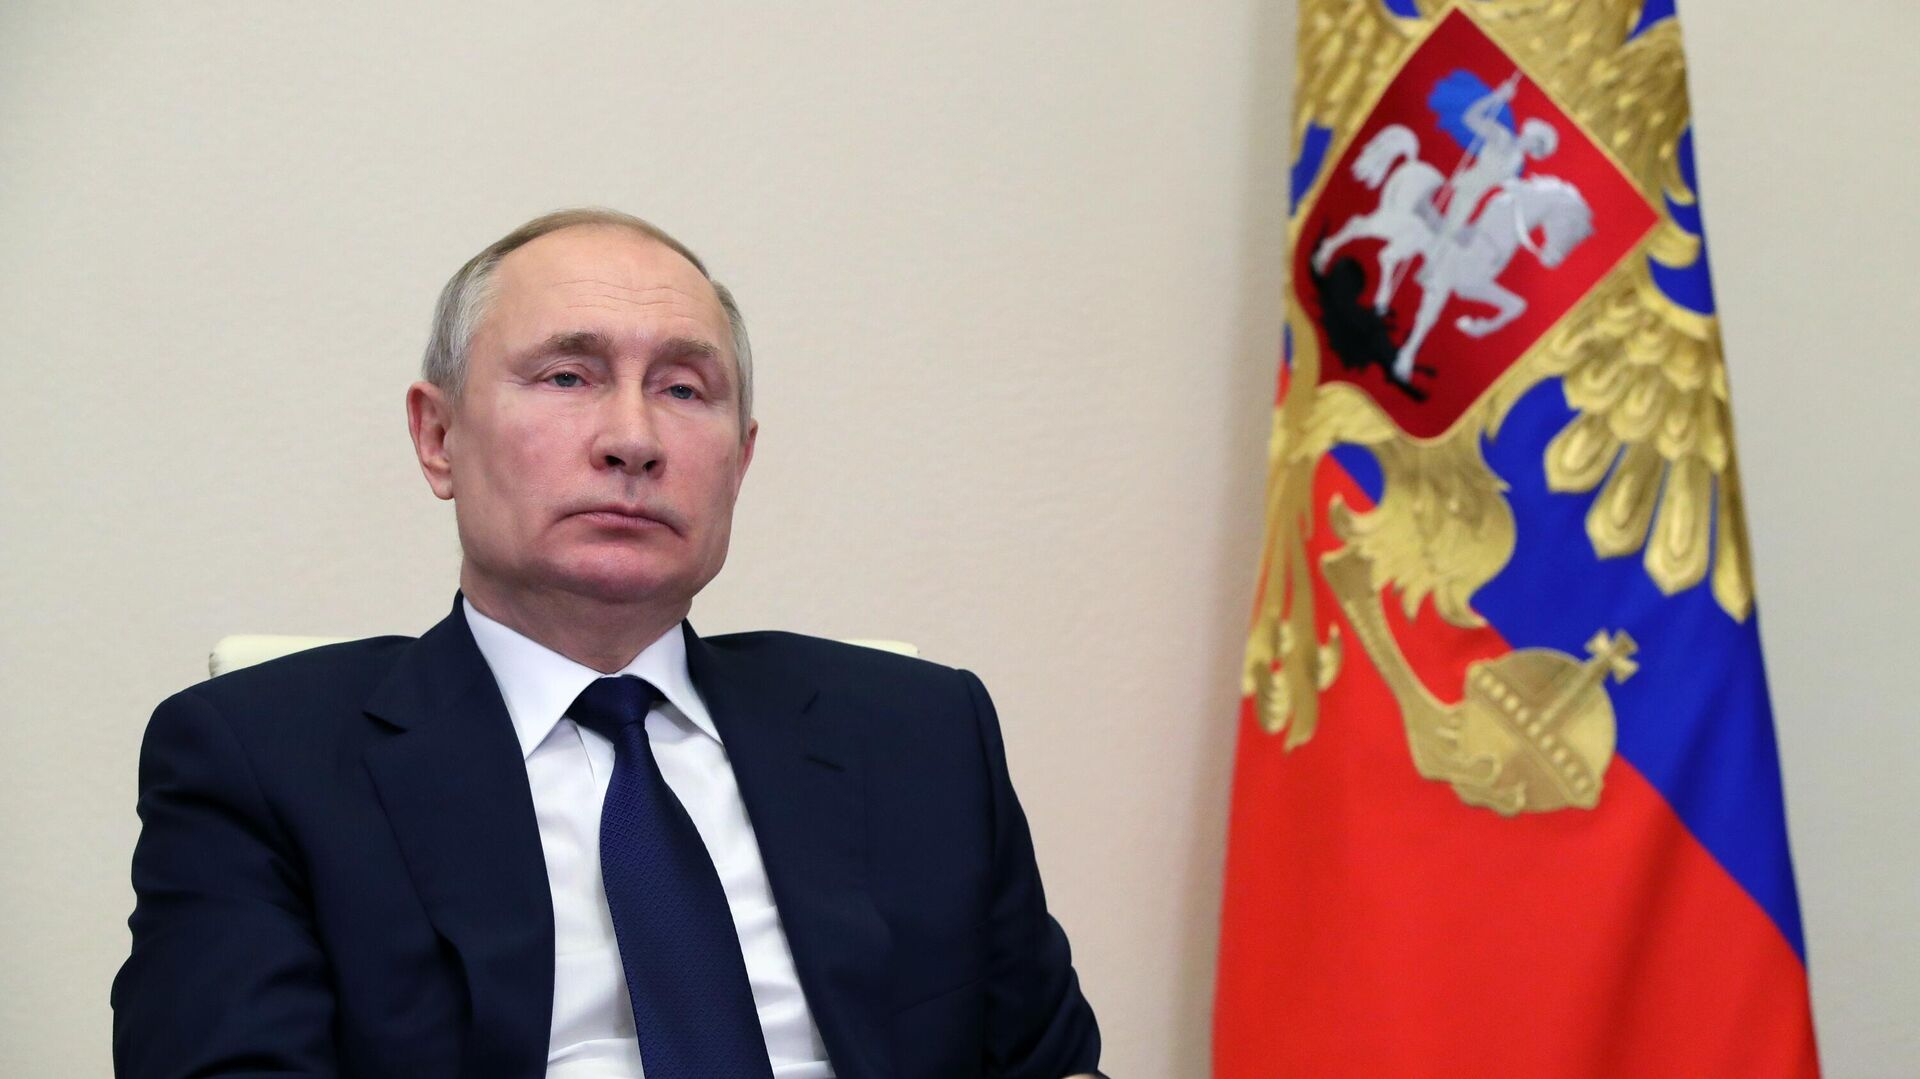 Vladímir Putin, presidente de Rusia - Sputnik Mundo, 1920, 01.03.2021